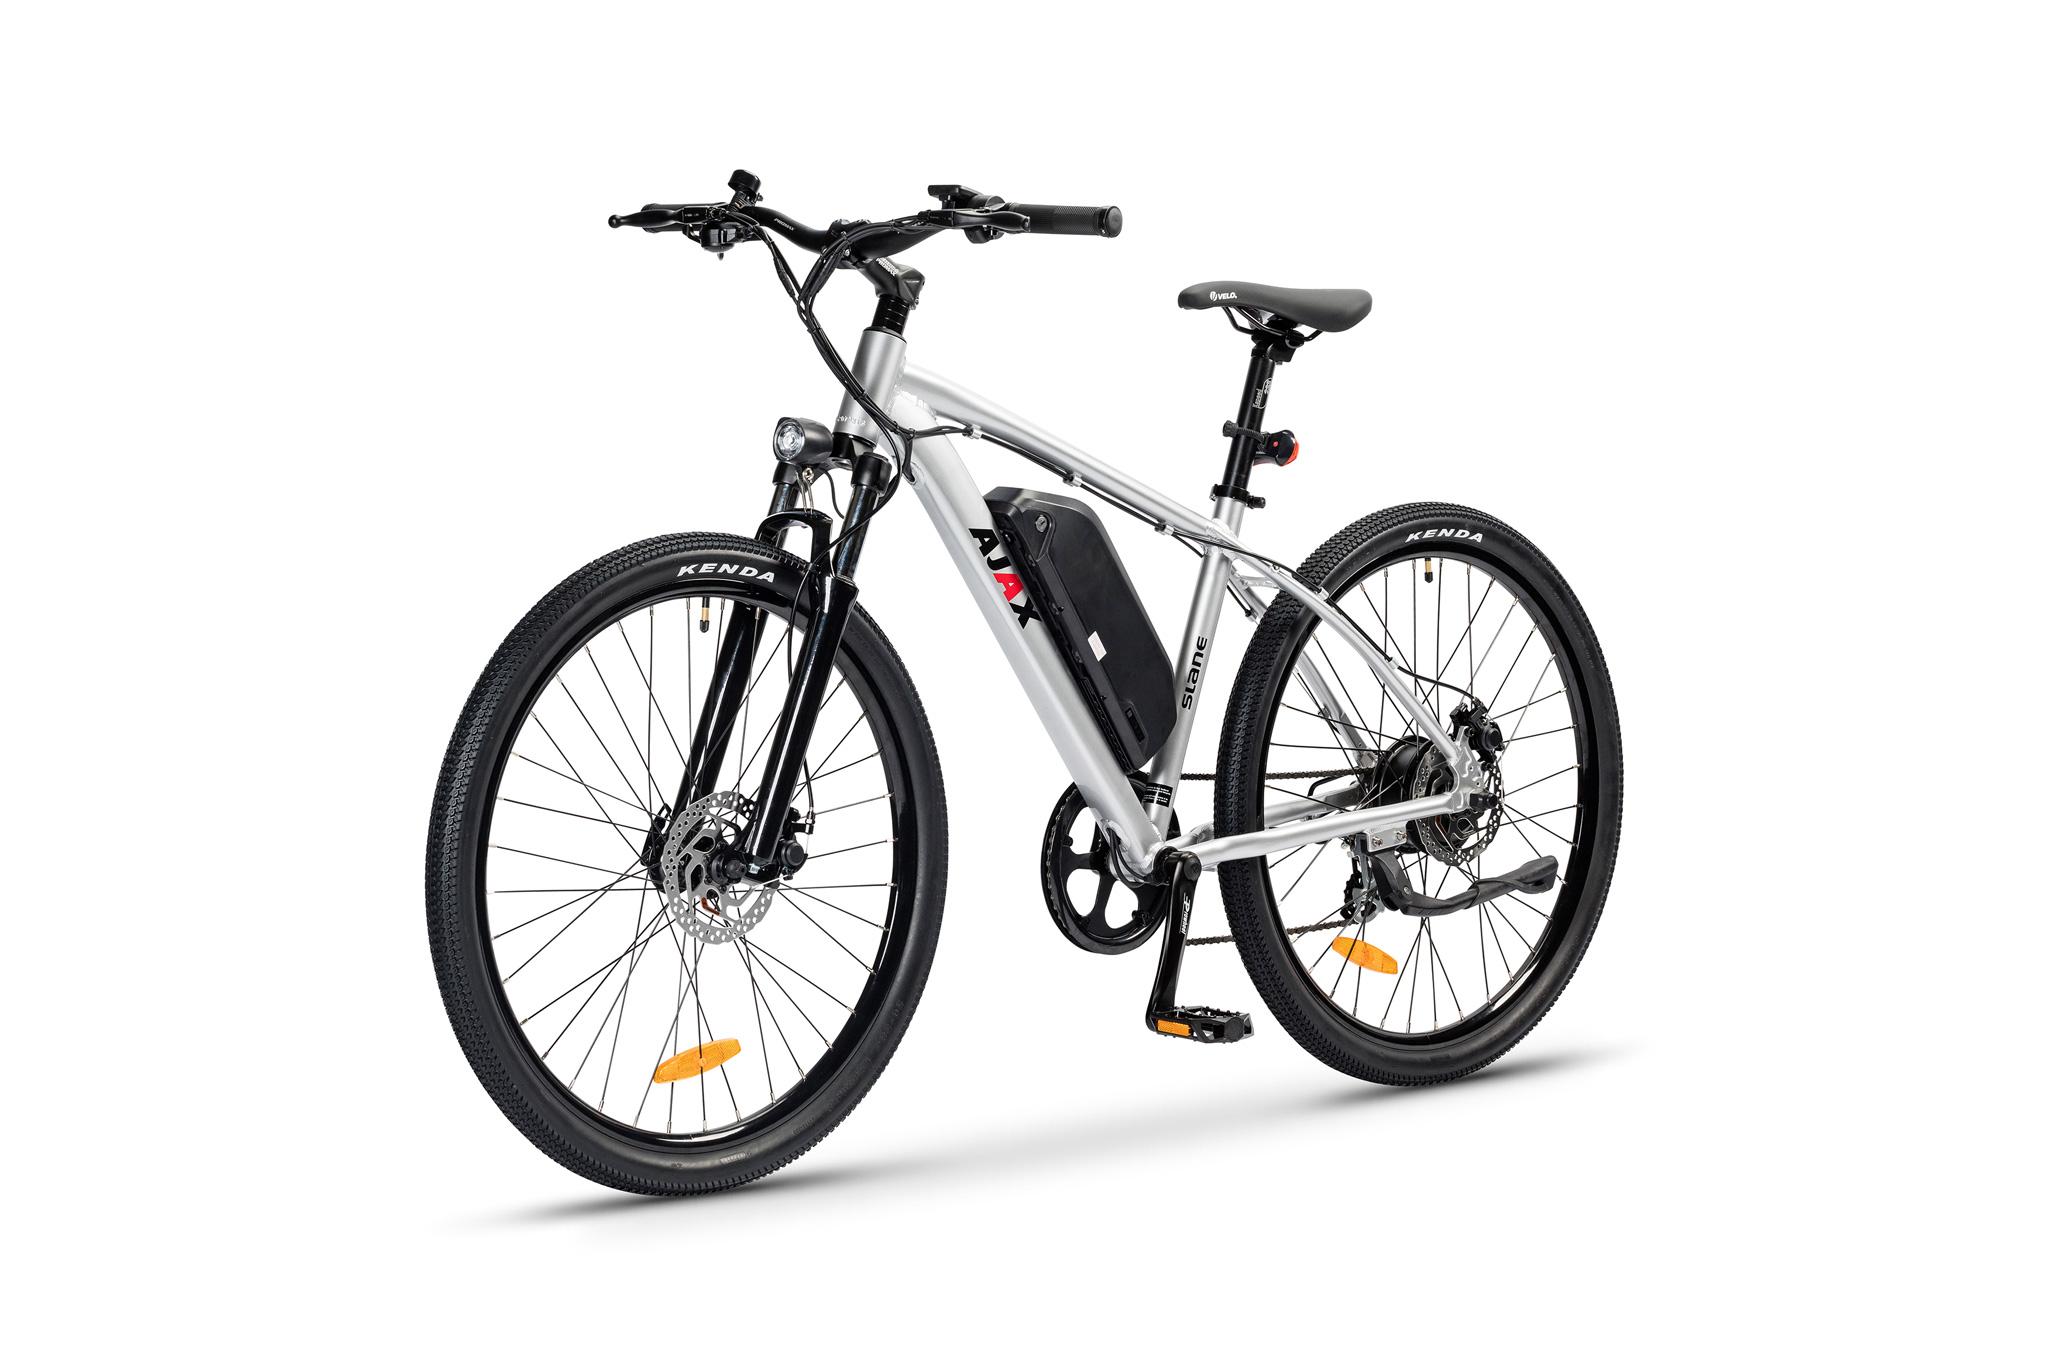 The SLANE Ajax MTB E-Bike Silver